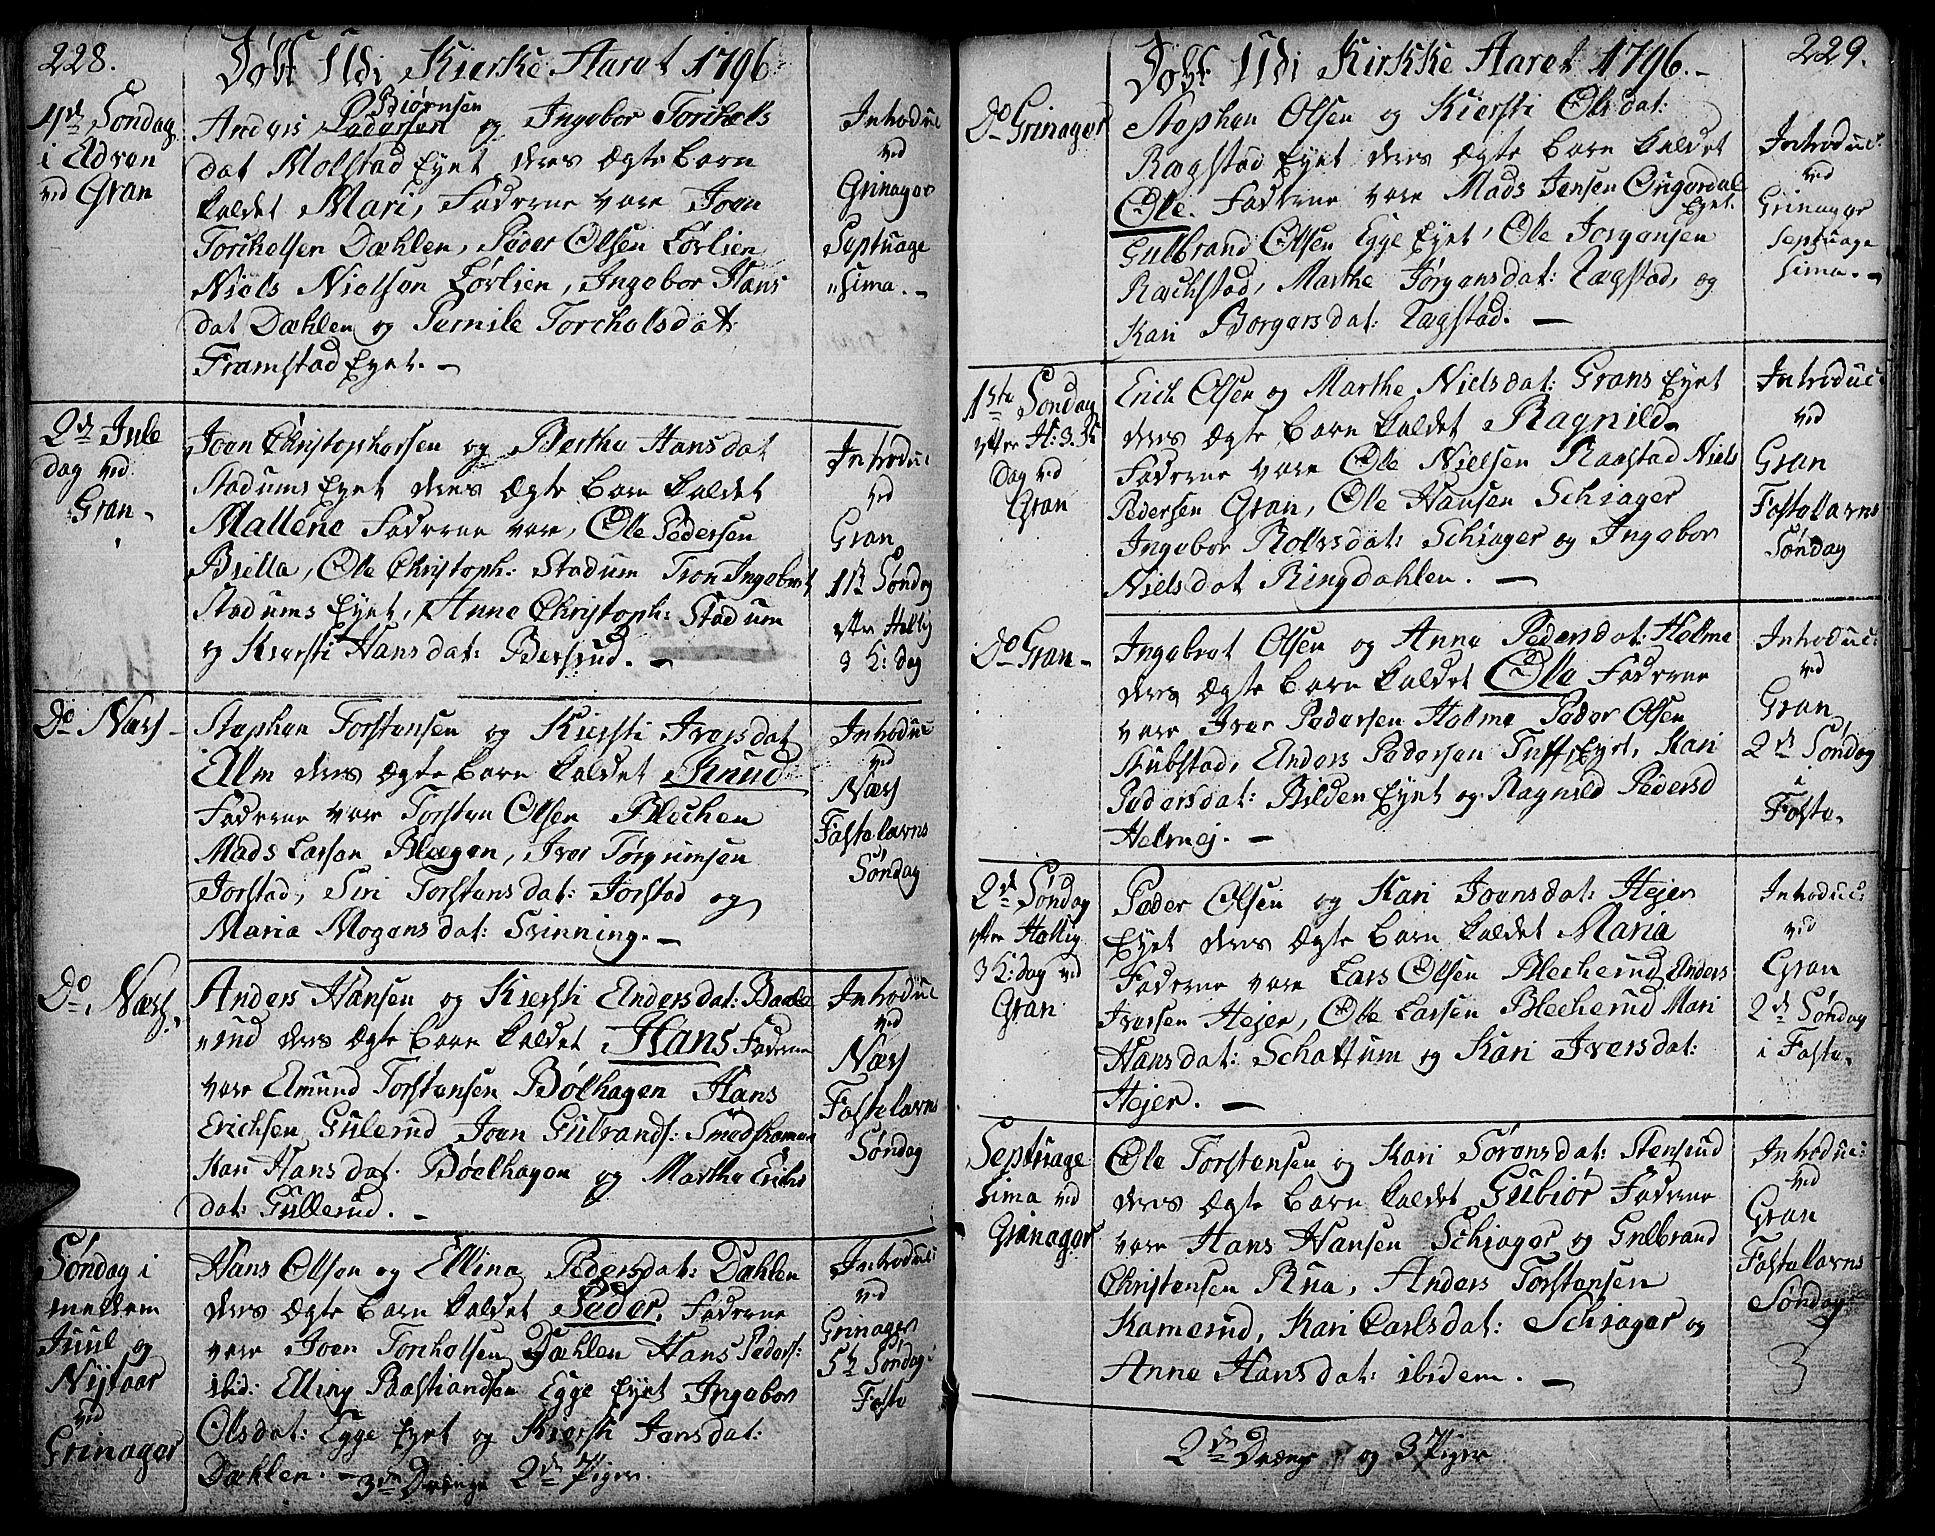 SAH, Gran prestekontor, Ministerialbok nr. 6, 1787-1824, s. 228-229